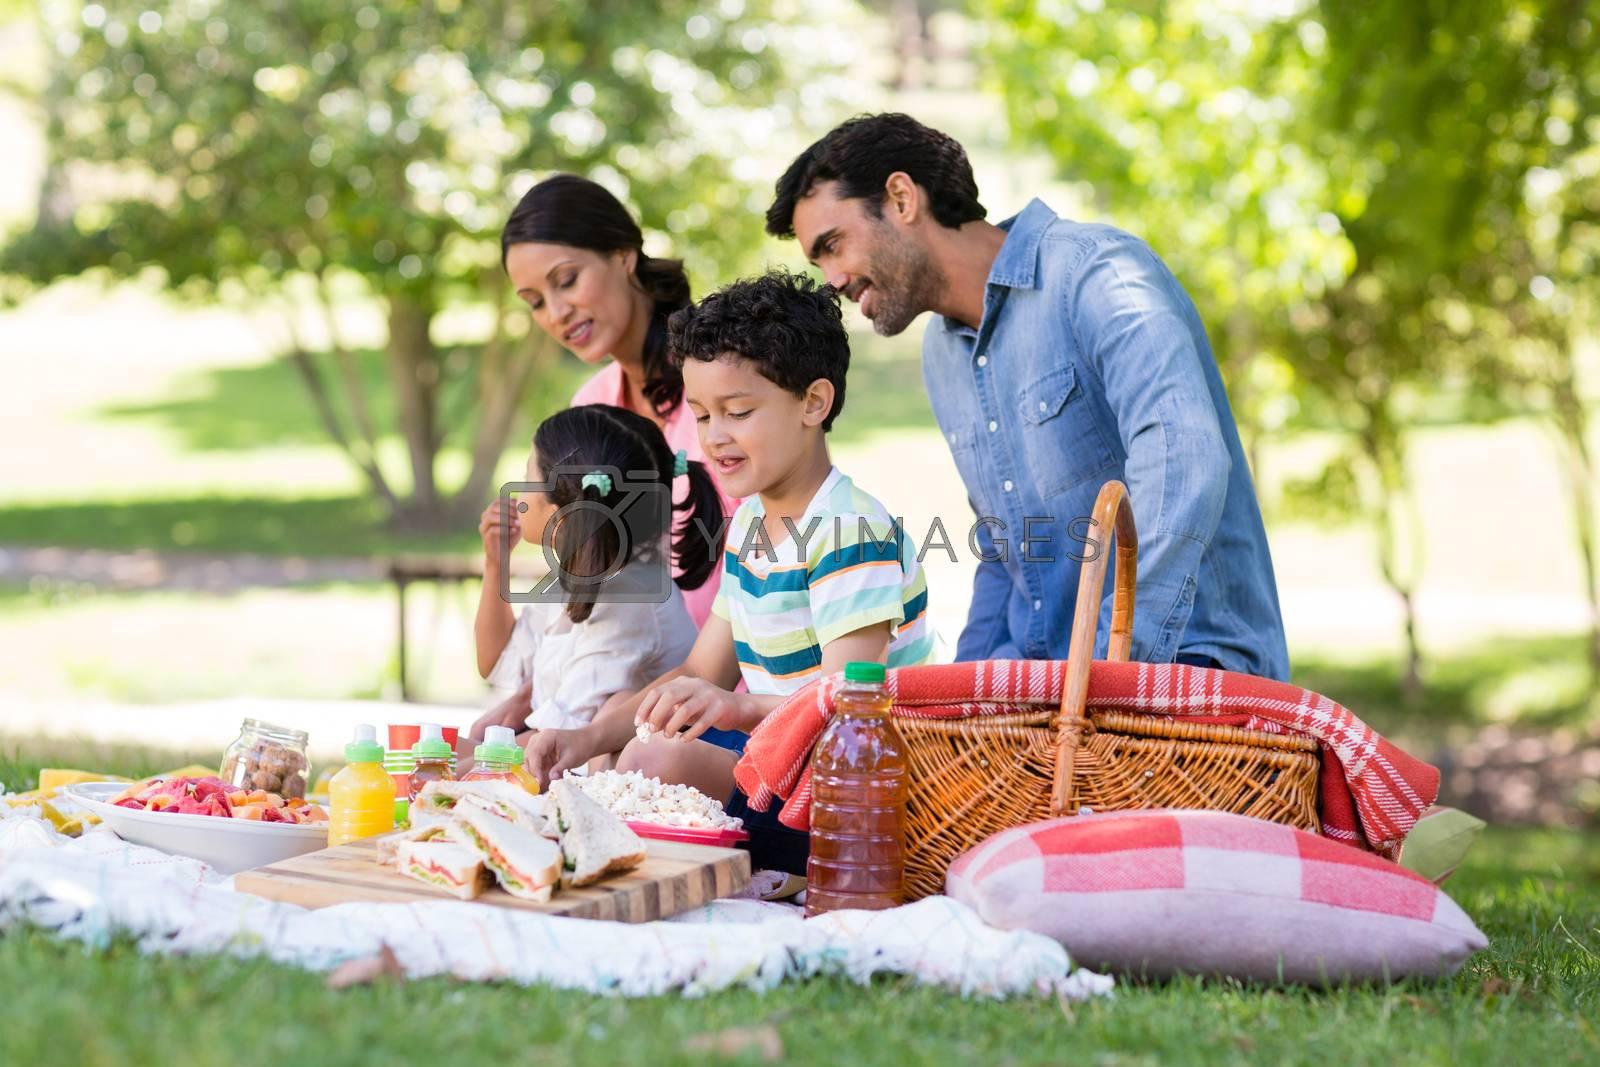 Happy family having breakfast in park on a sunny day